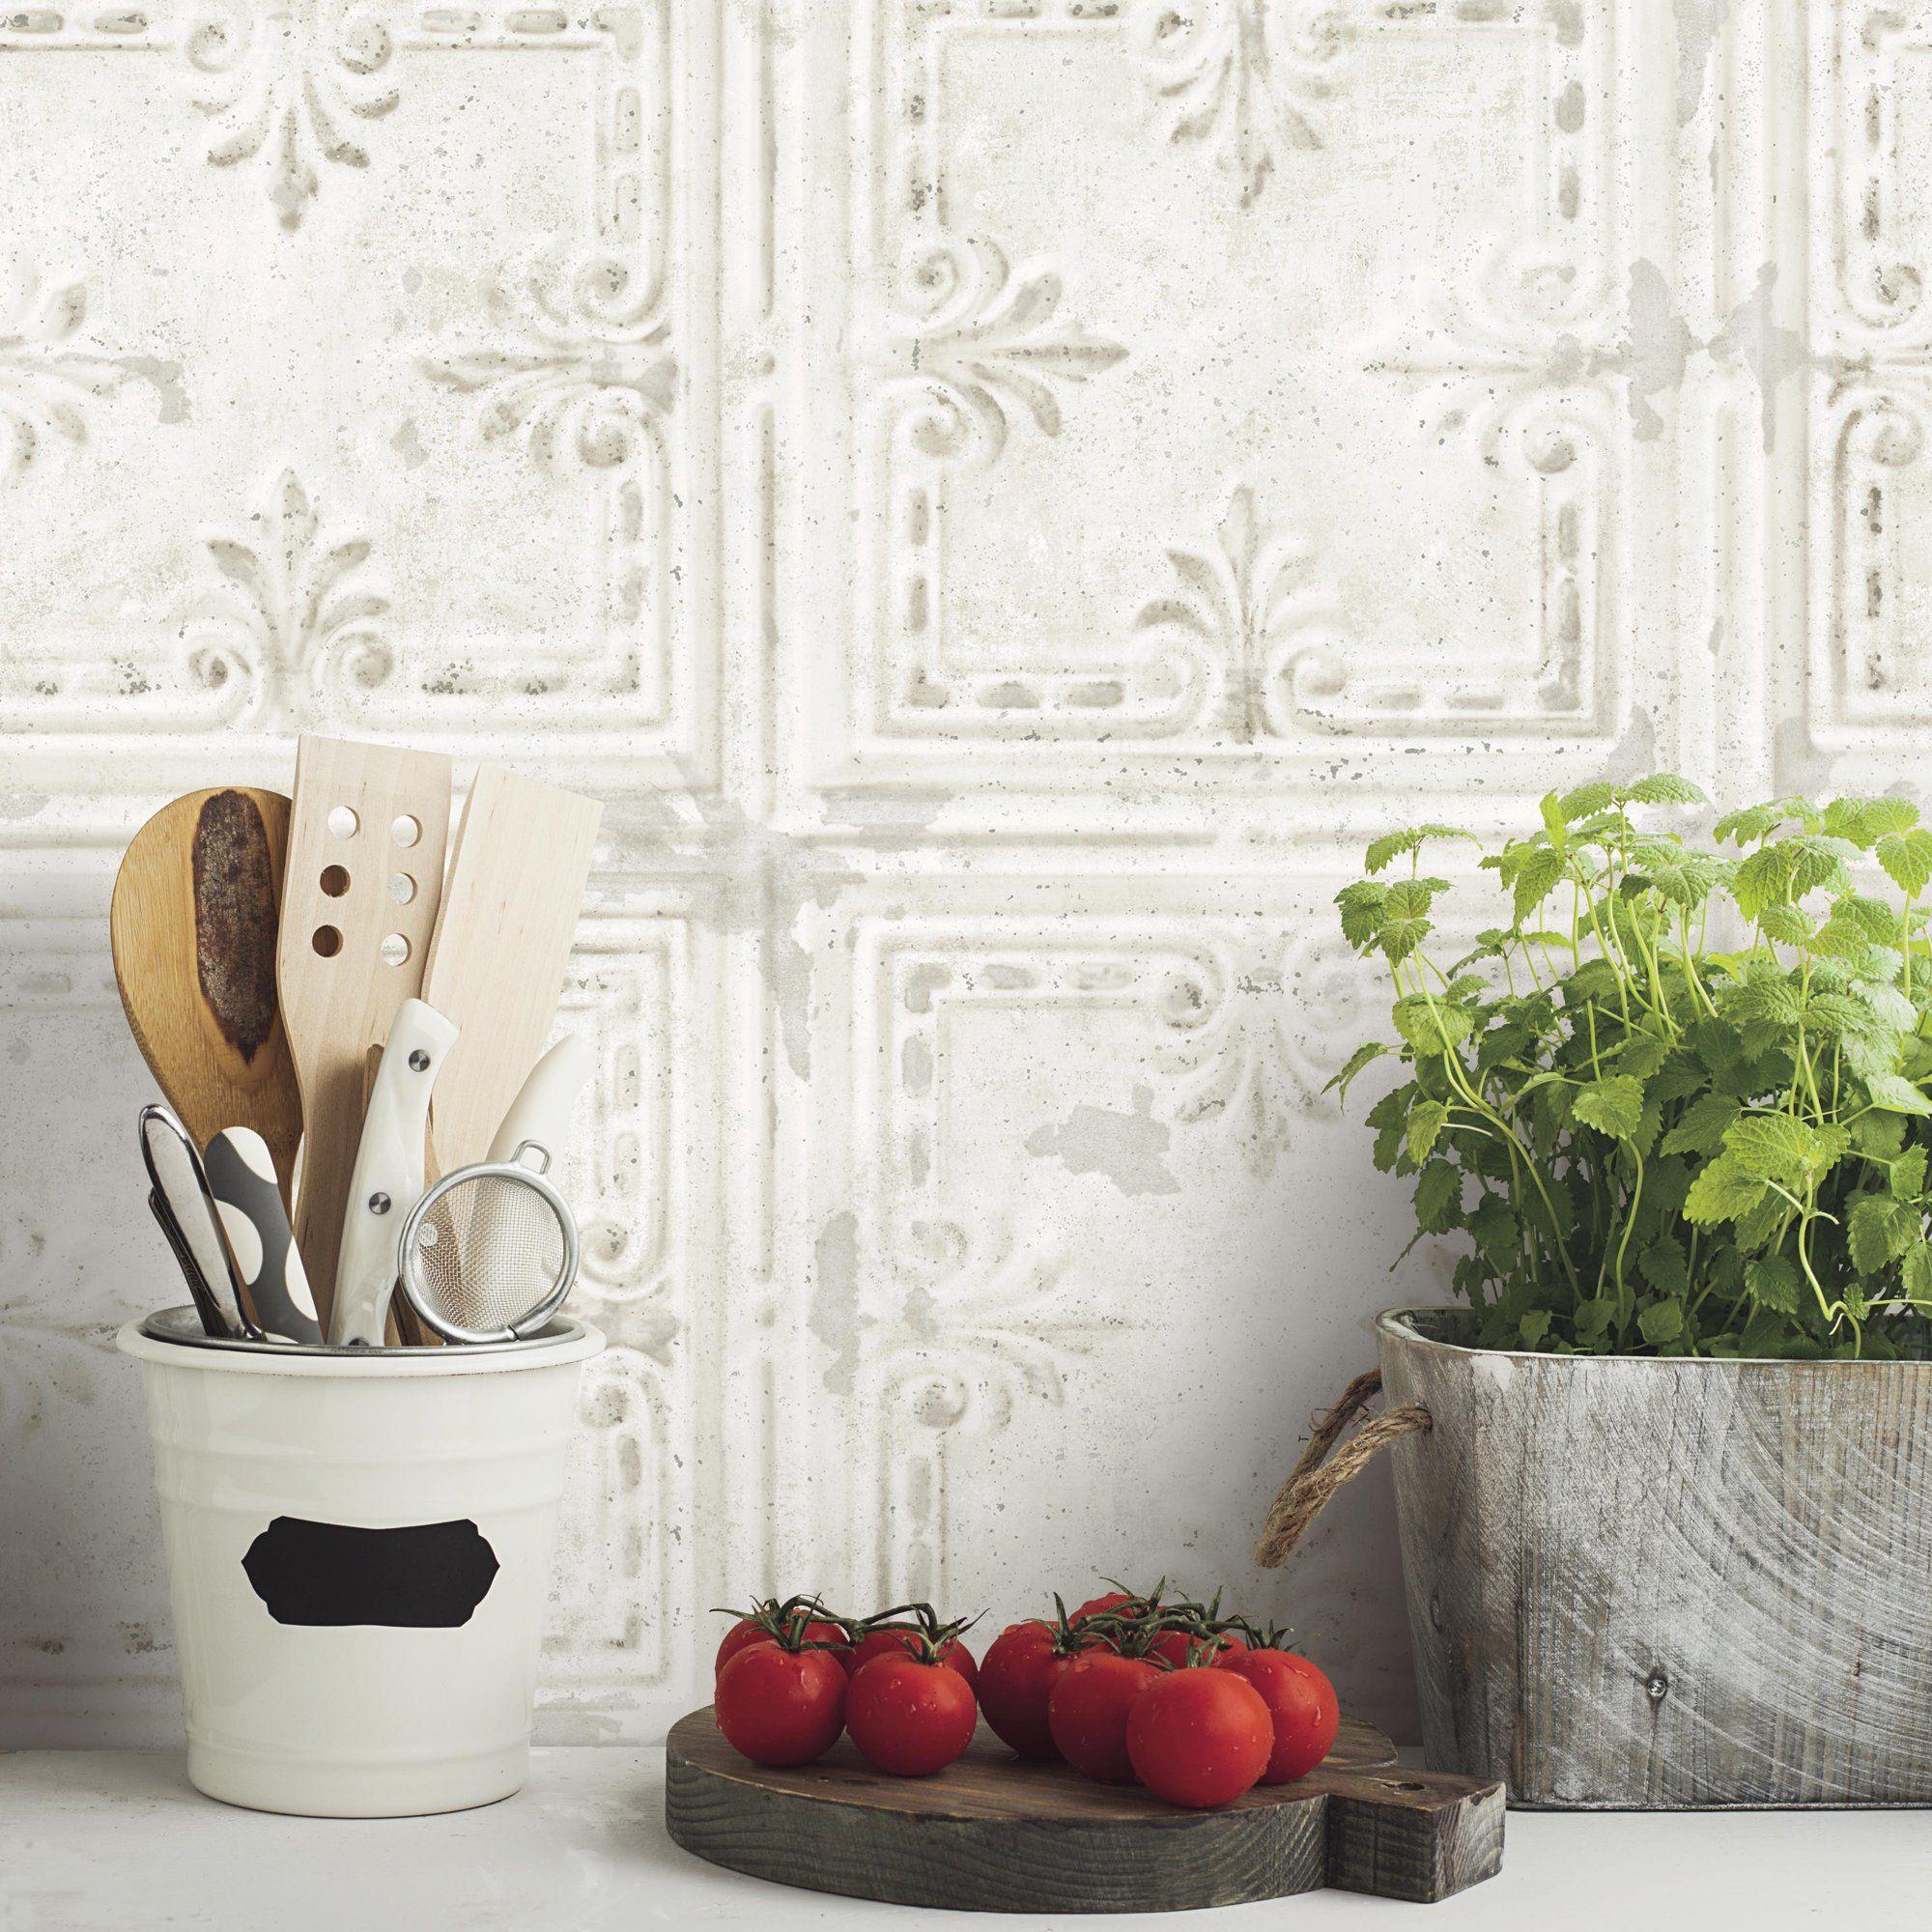 Roommates Tin Tile White Peel And Stick Wallpaper Walmart Com Tin Tiles Peel And Stick Wallpaper Peelable Wallpaper